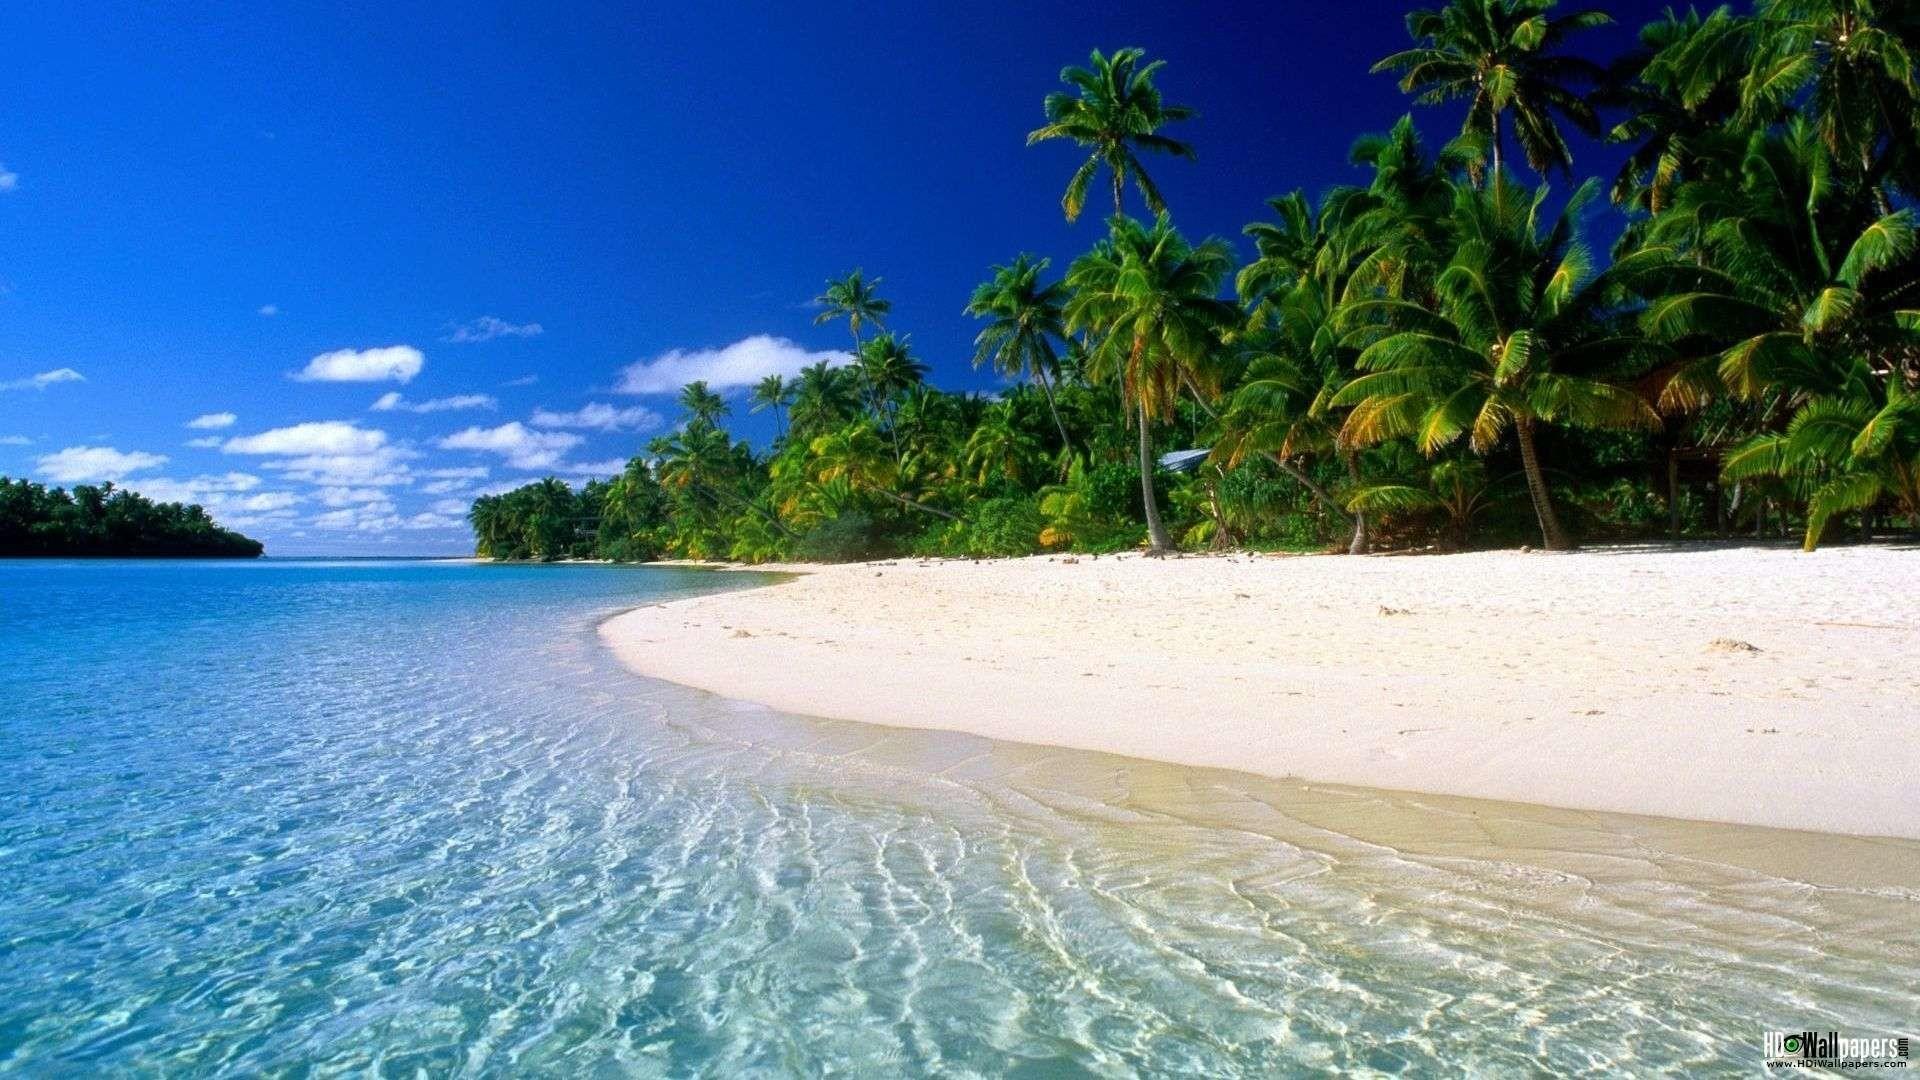 Tropical-Beach-Resort-Wallpapers-for-Desktop-Background-Full-